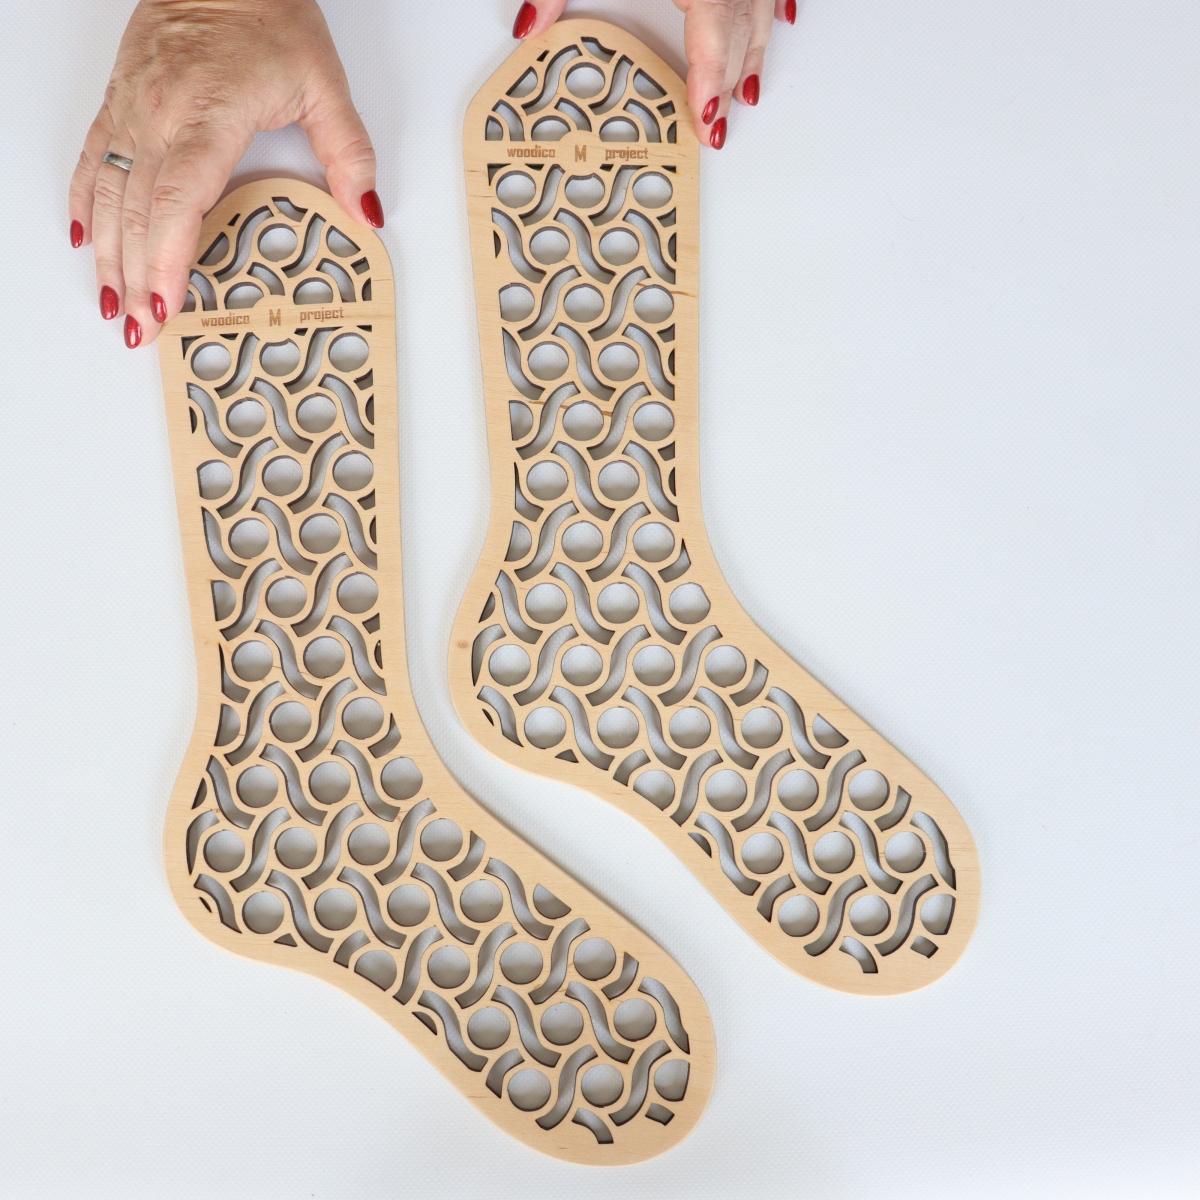 woodico.pro wooden sock blockers pasta 5 1200x1200 - Wooden sock blockers / Pasta